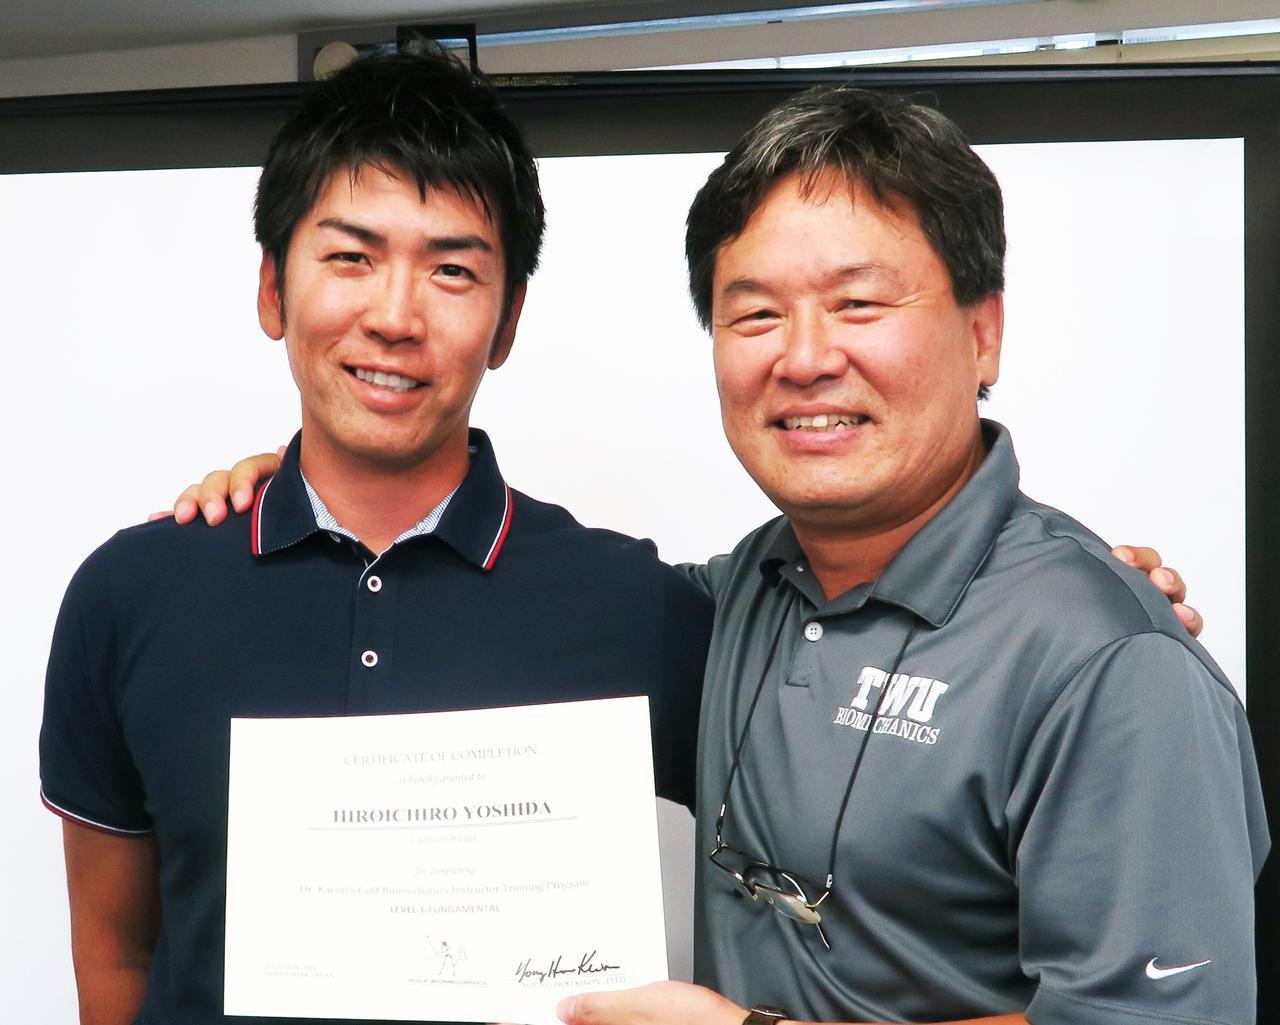 画像: 吉田洋一郎(写真左)とDrクォン教授(写真右)